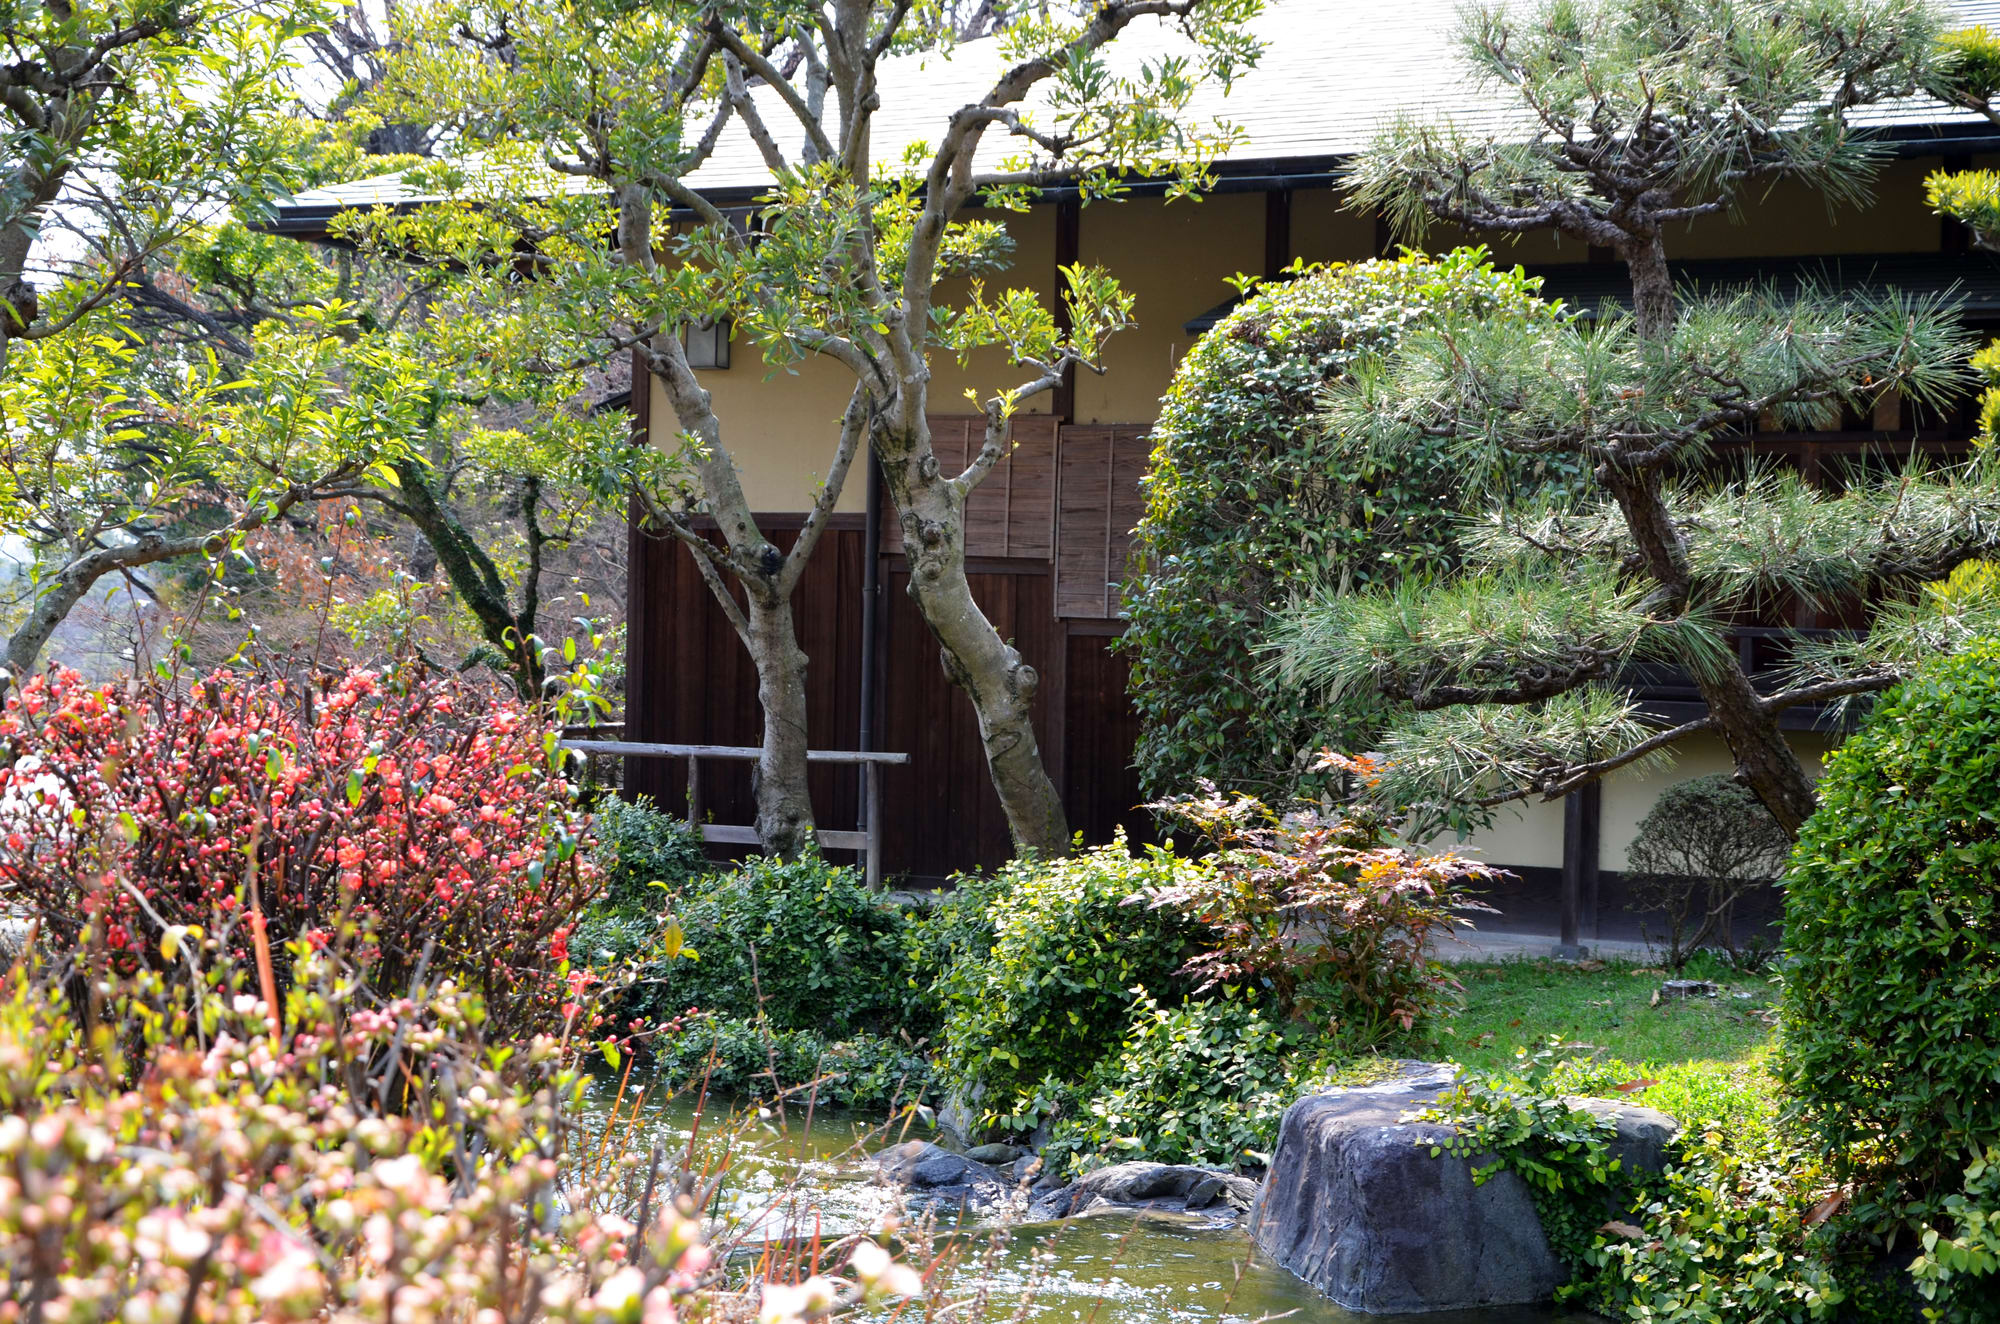 At the子規庵(Shikian) in remembrance正岡子規(Shiki Masaoka)